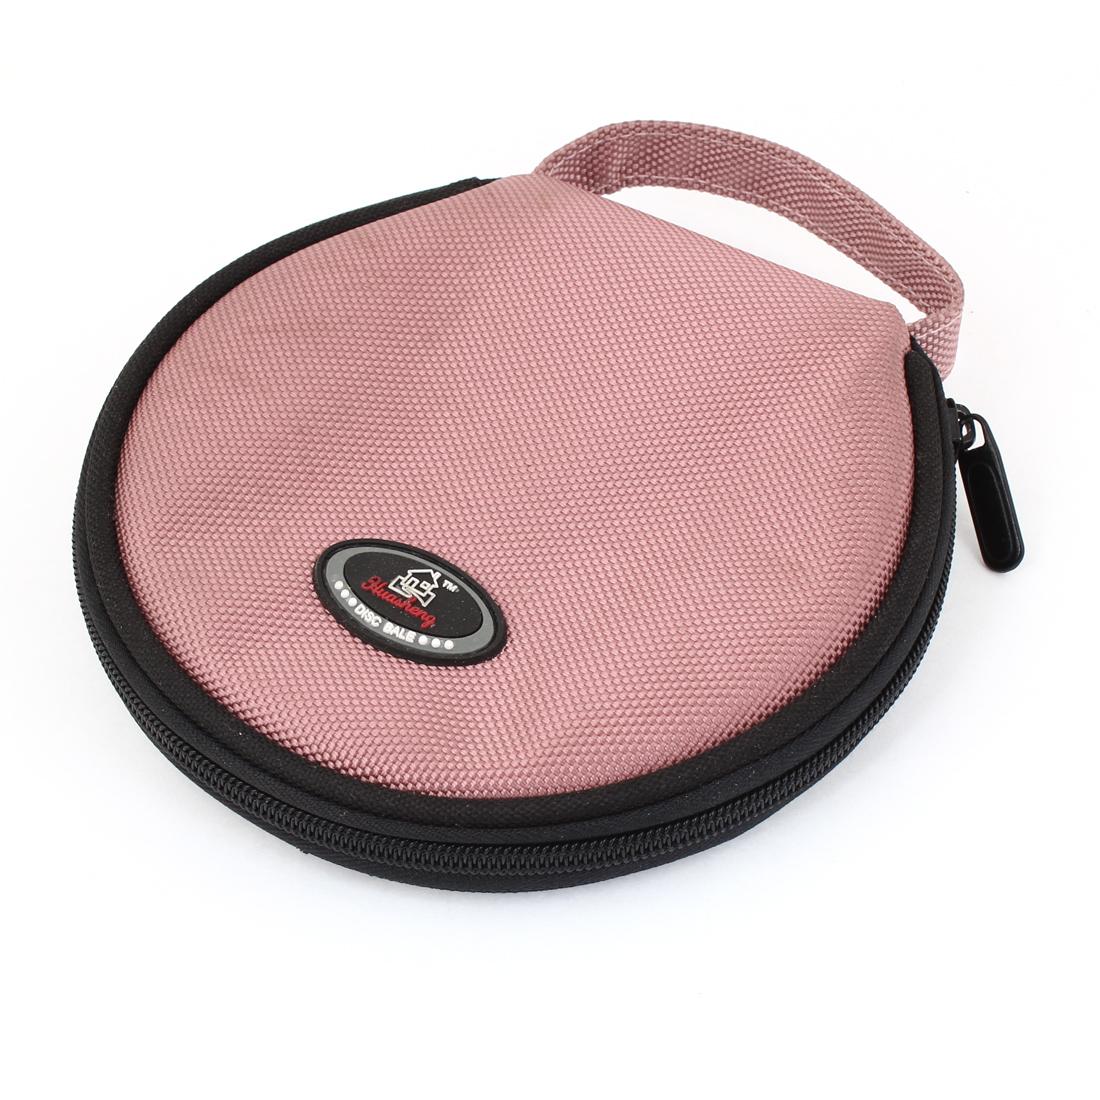 Zipper Closure Black Light Pink Nylon Shell 20 Capacity DVD CD Organizer Bag